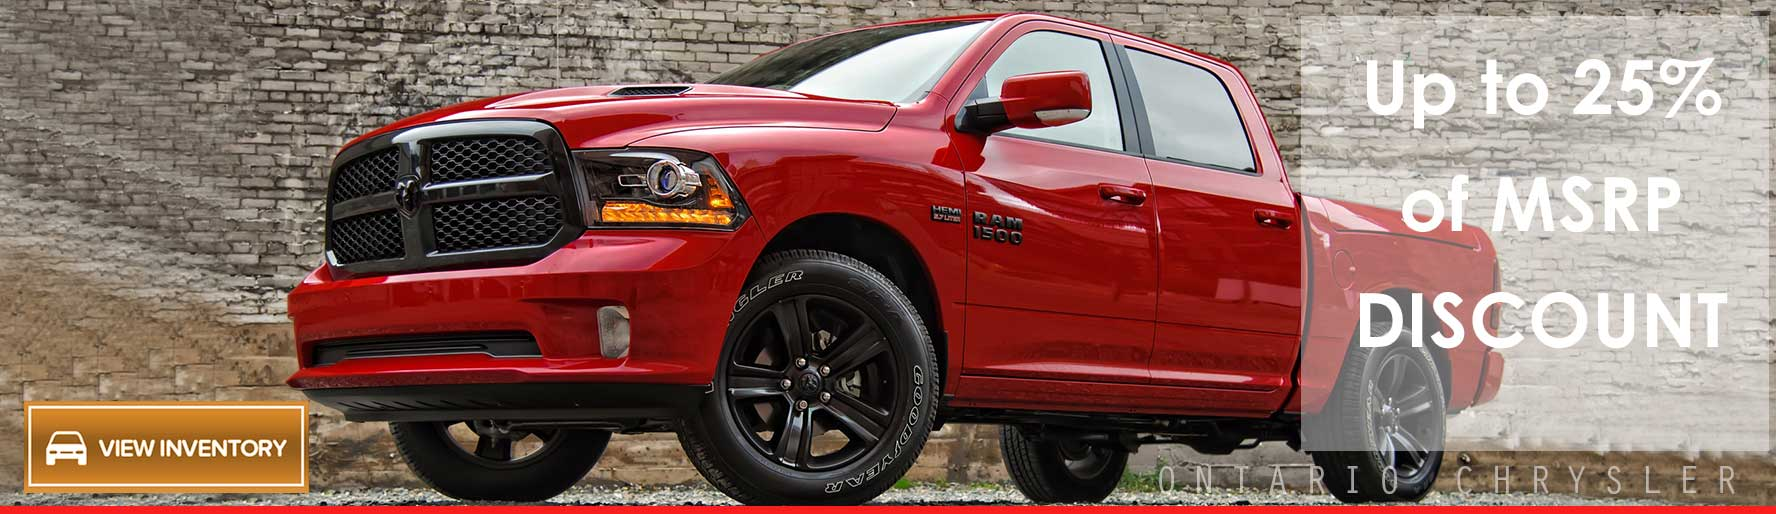 Ontario Chrysler Jeep Dodge Ram   Toronto & Mississauga ...